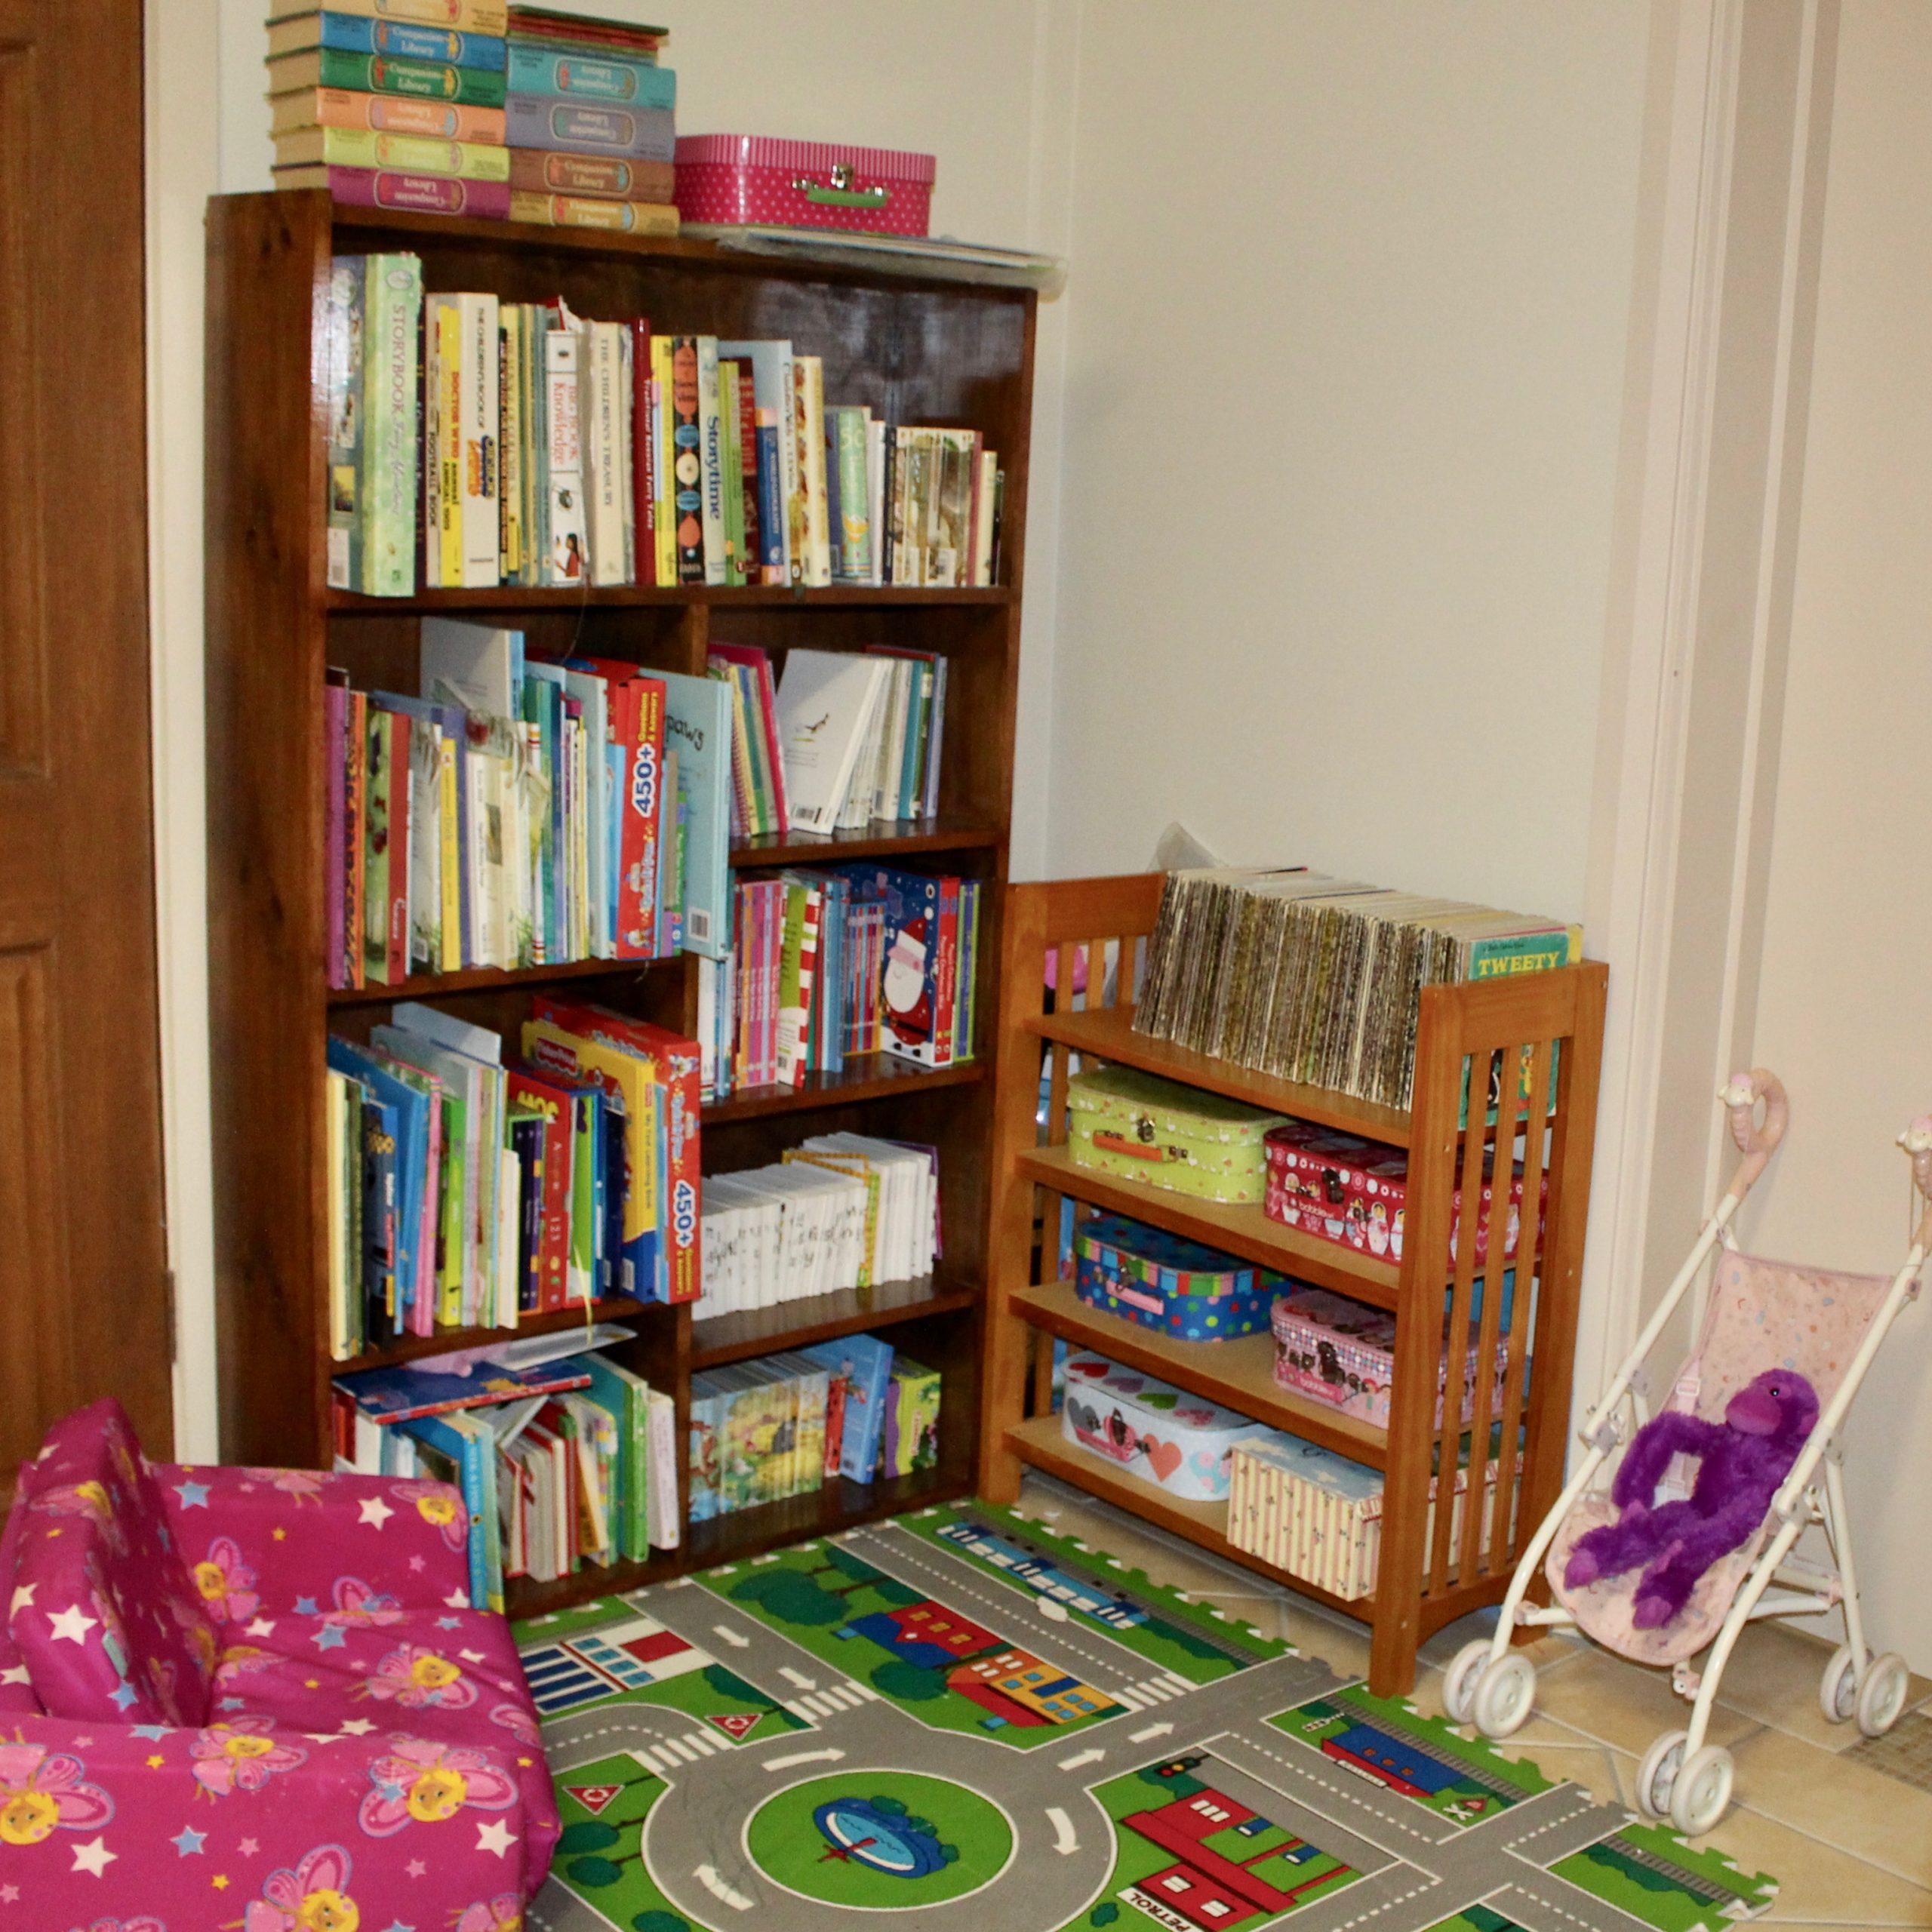 Playroom Reading Corner Before Organisation - The Organising Bee Canberra